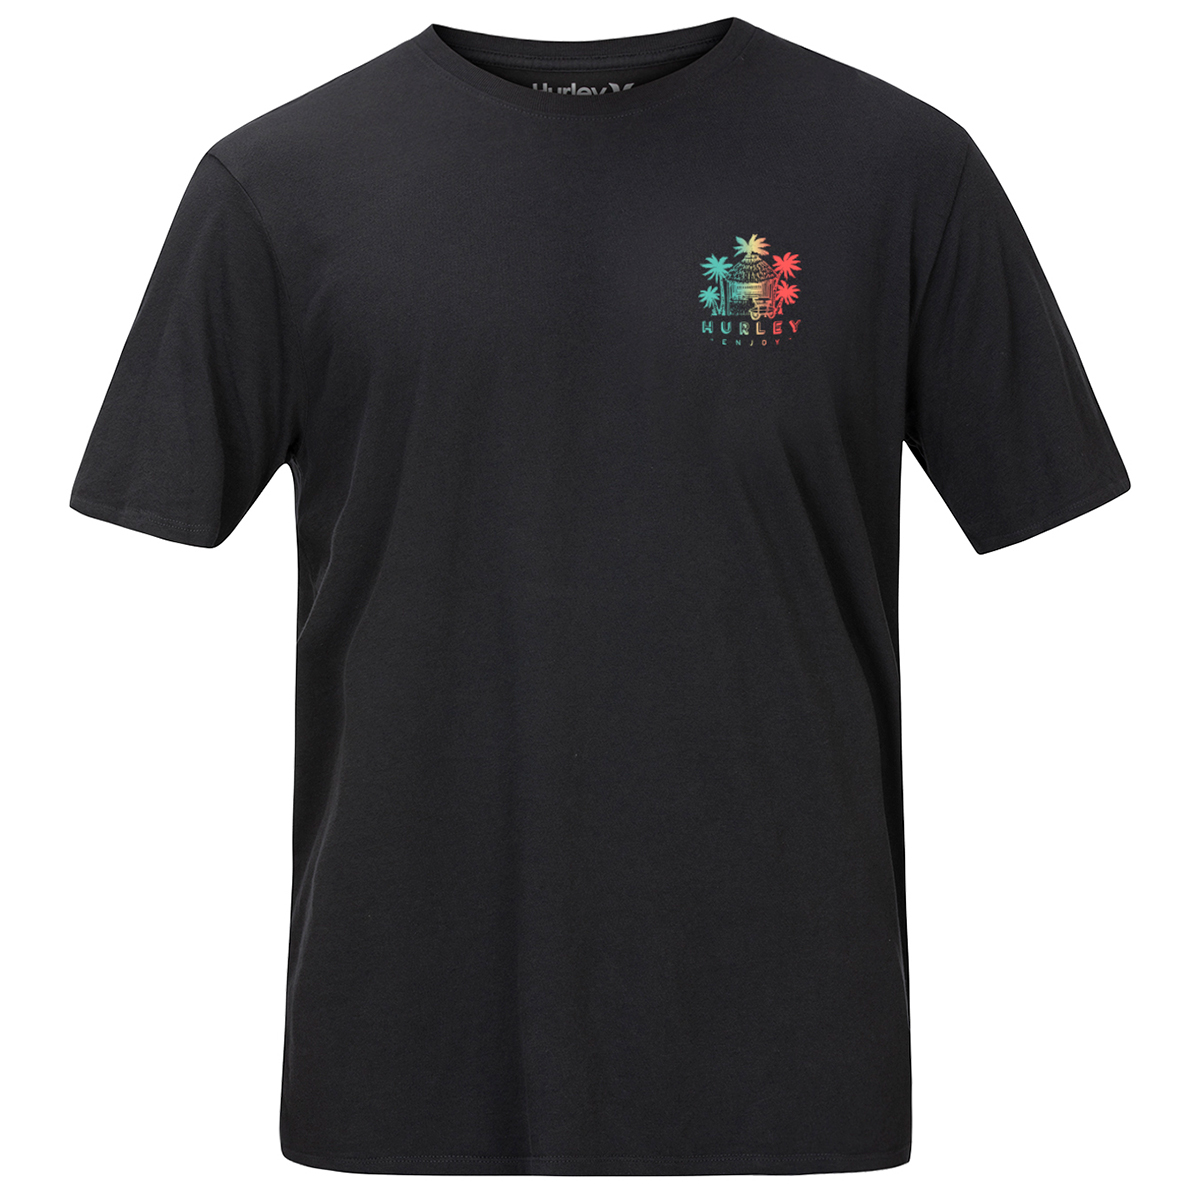 Hurley Men's Get Shacked Short-Sleeve Tee - Black, XL